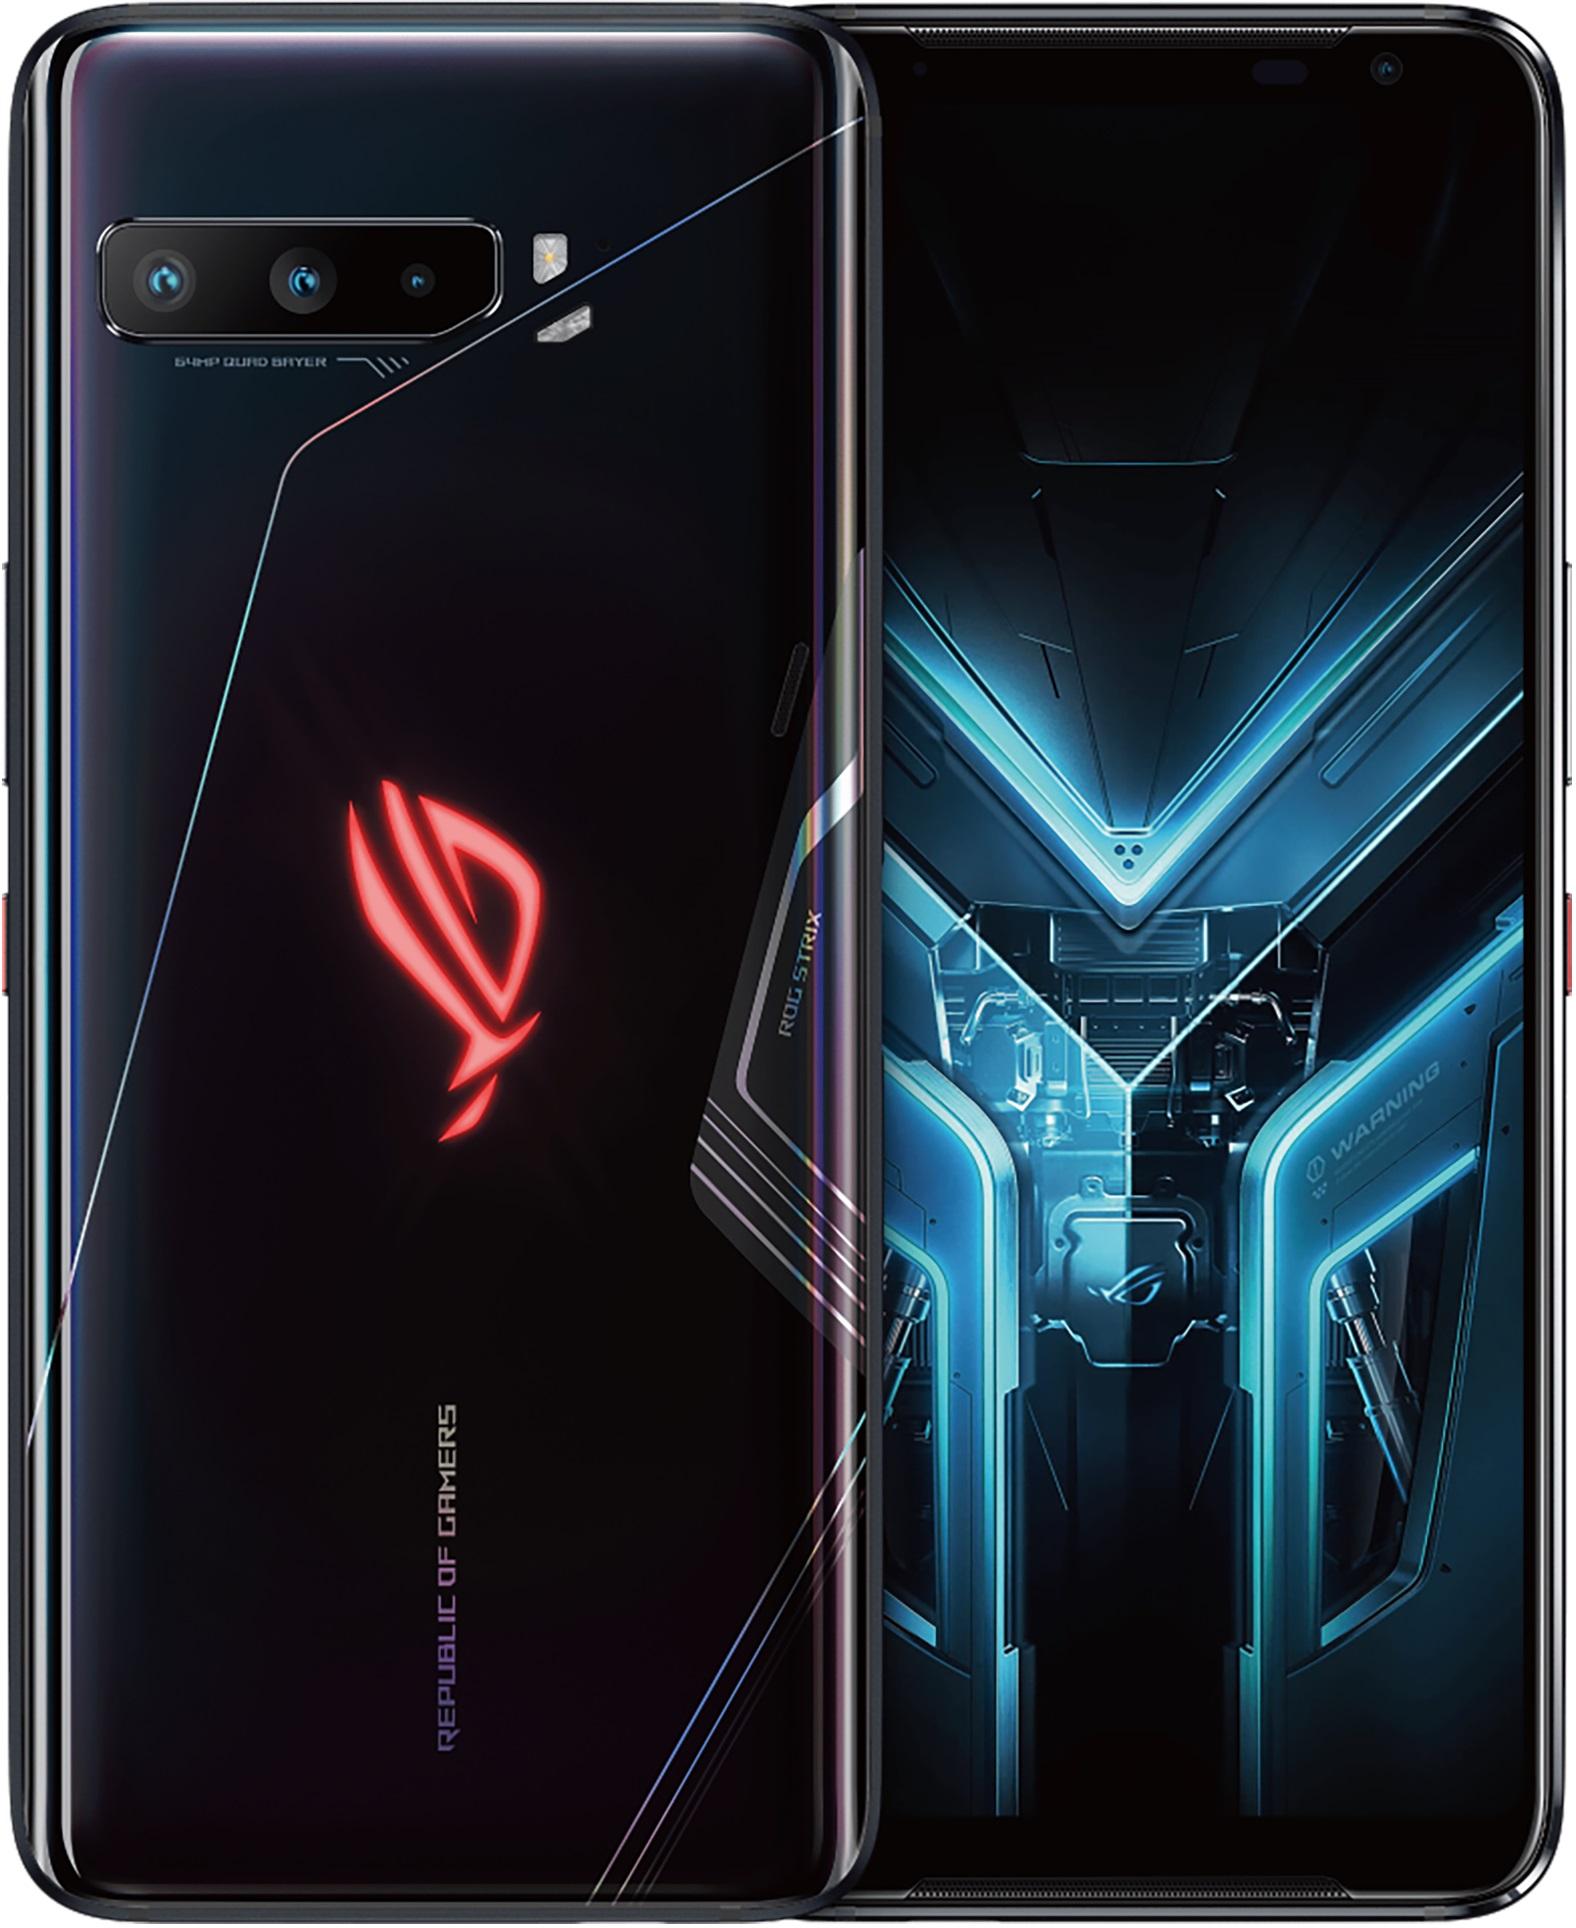 Asus ROG Phone 3 Strix Edition